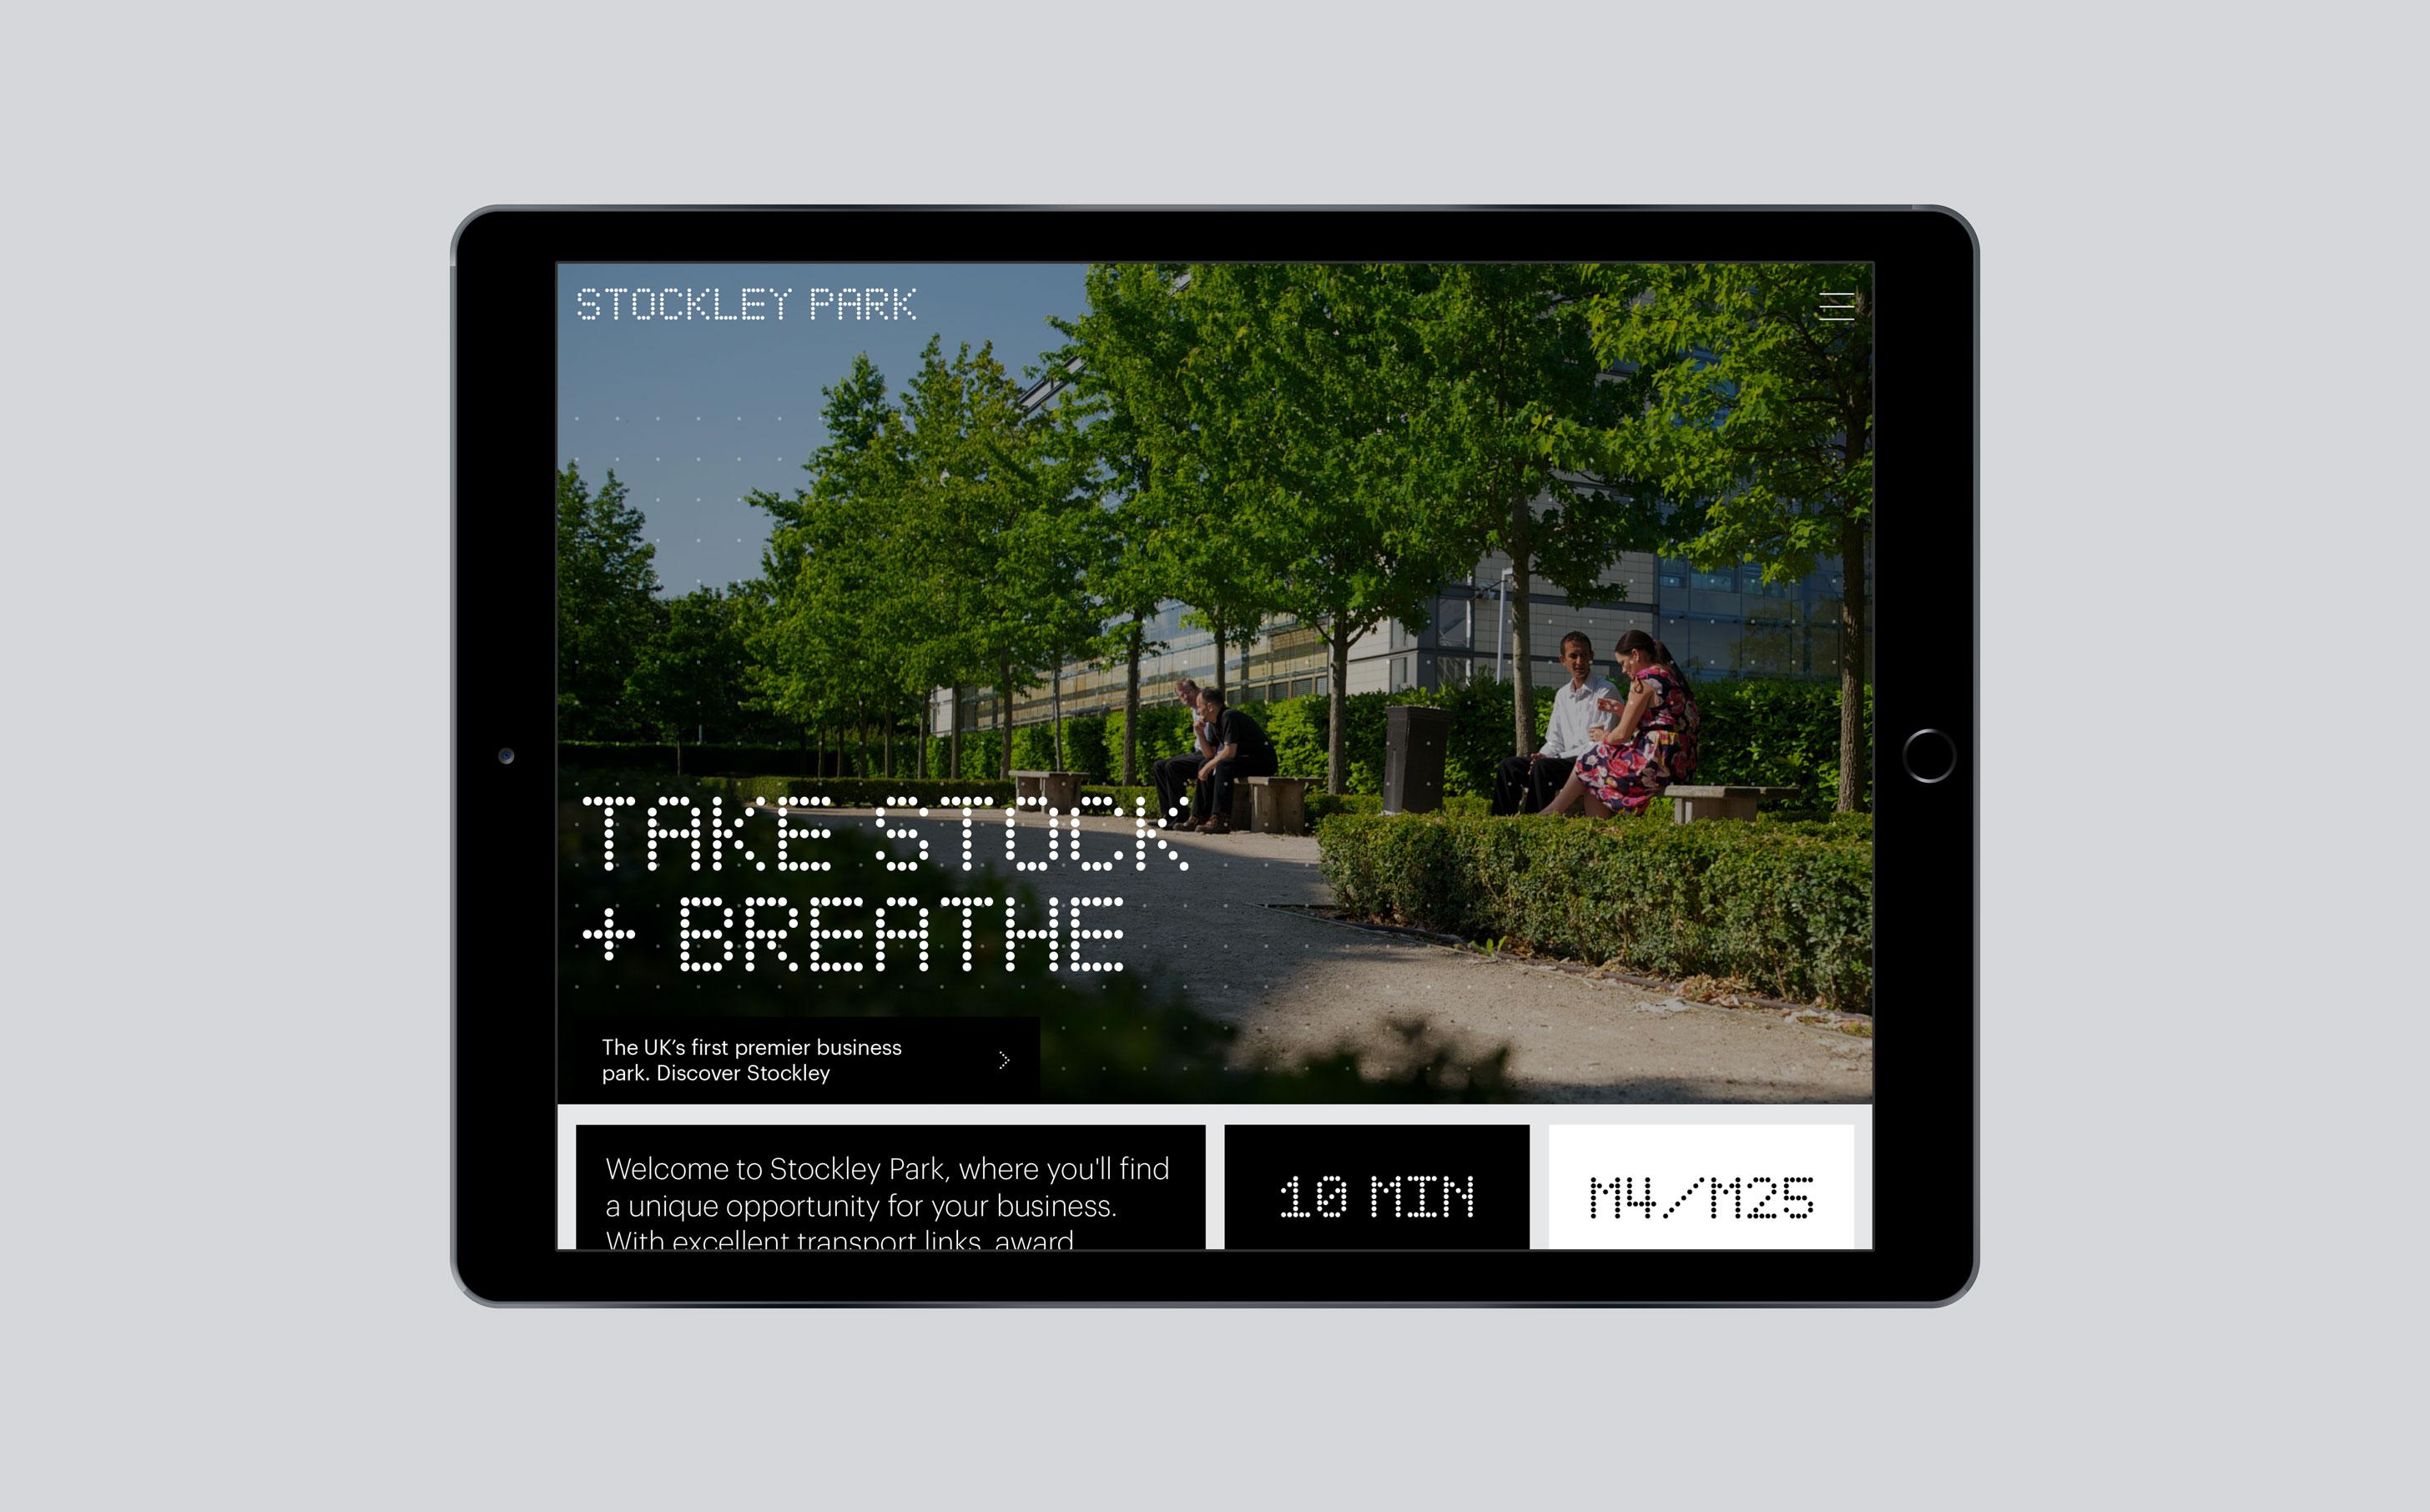 stockley park website home